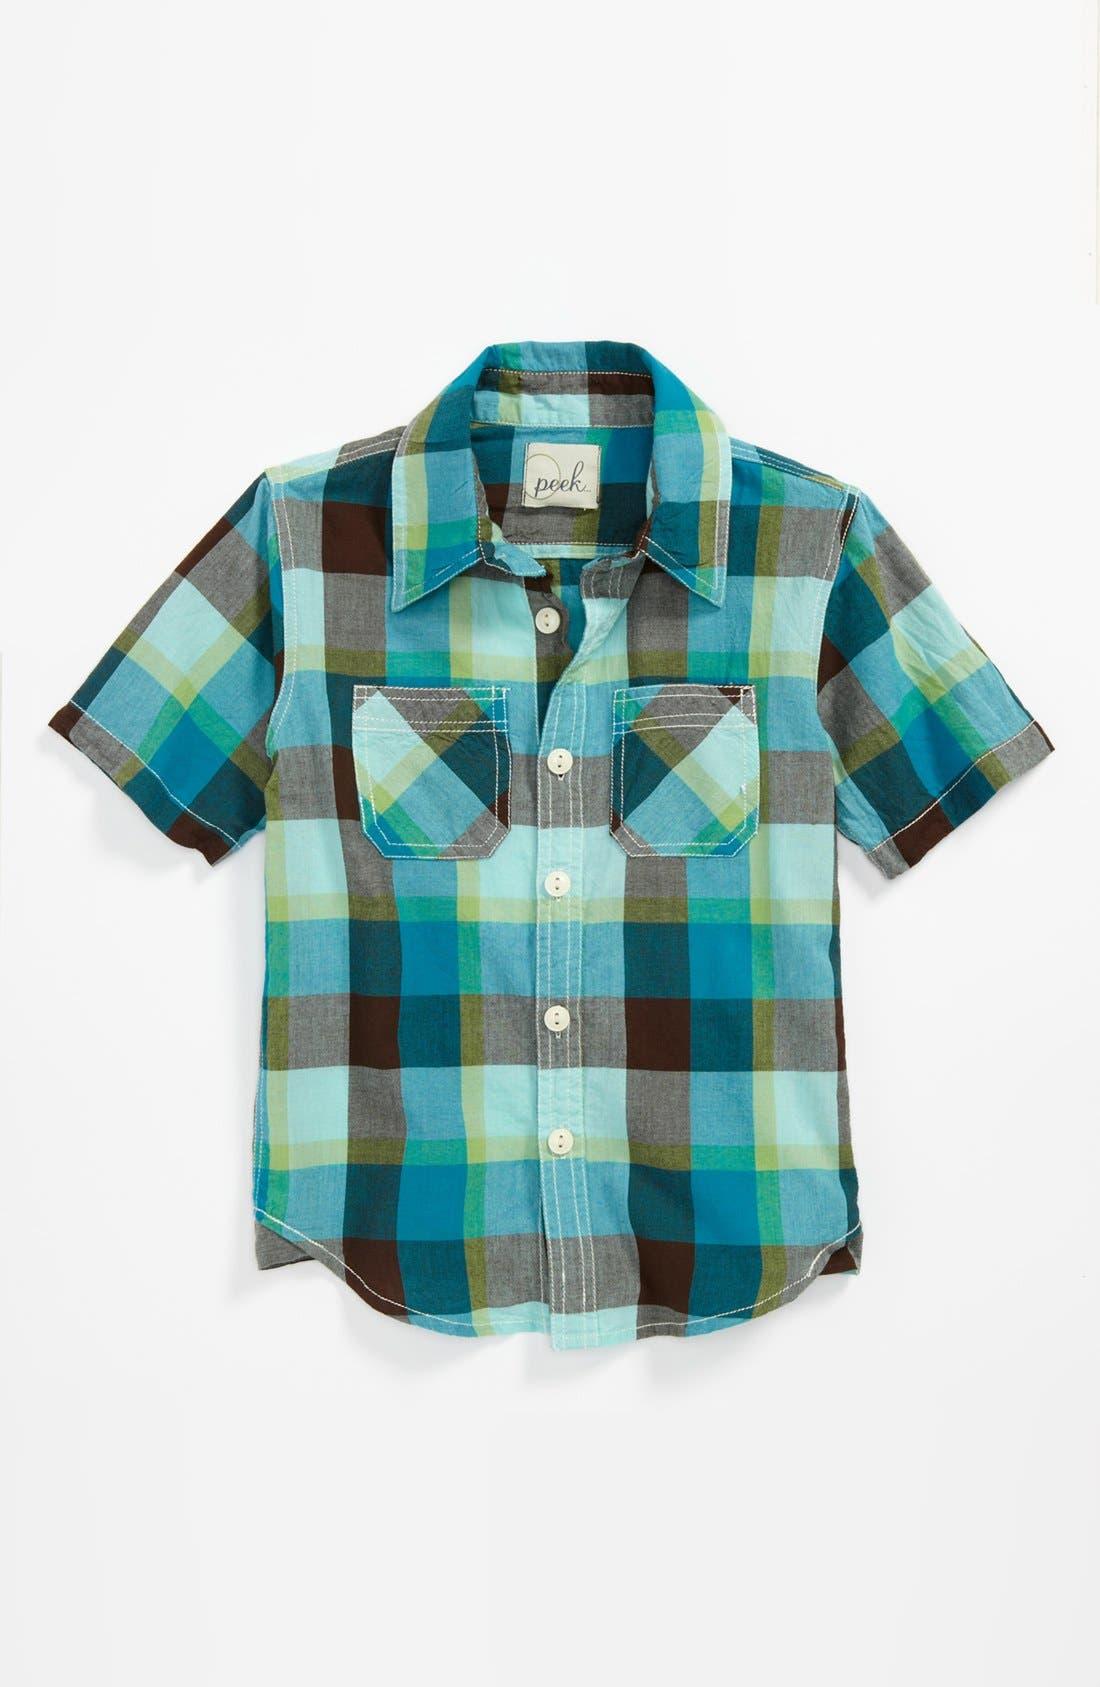 Main Image - Peek 'Clint' Utility Shirt (Big Boys)